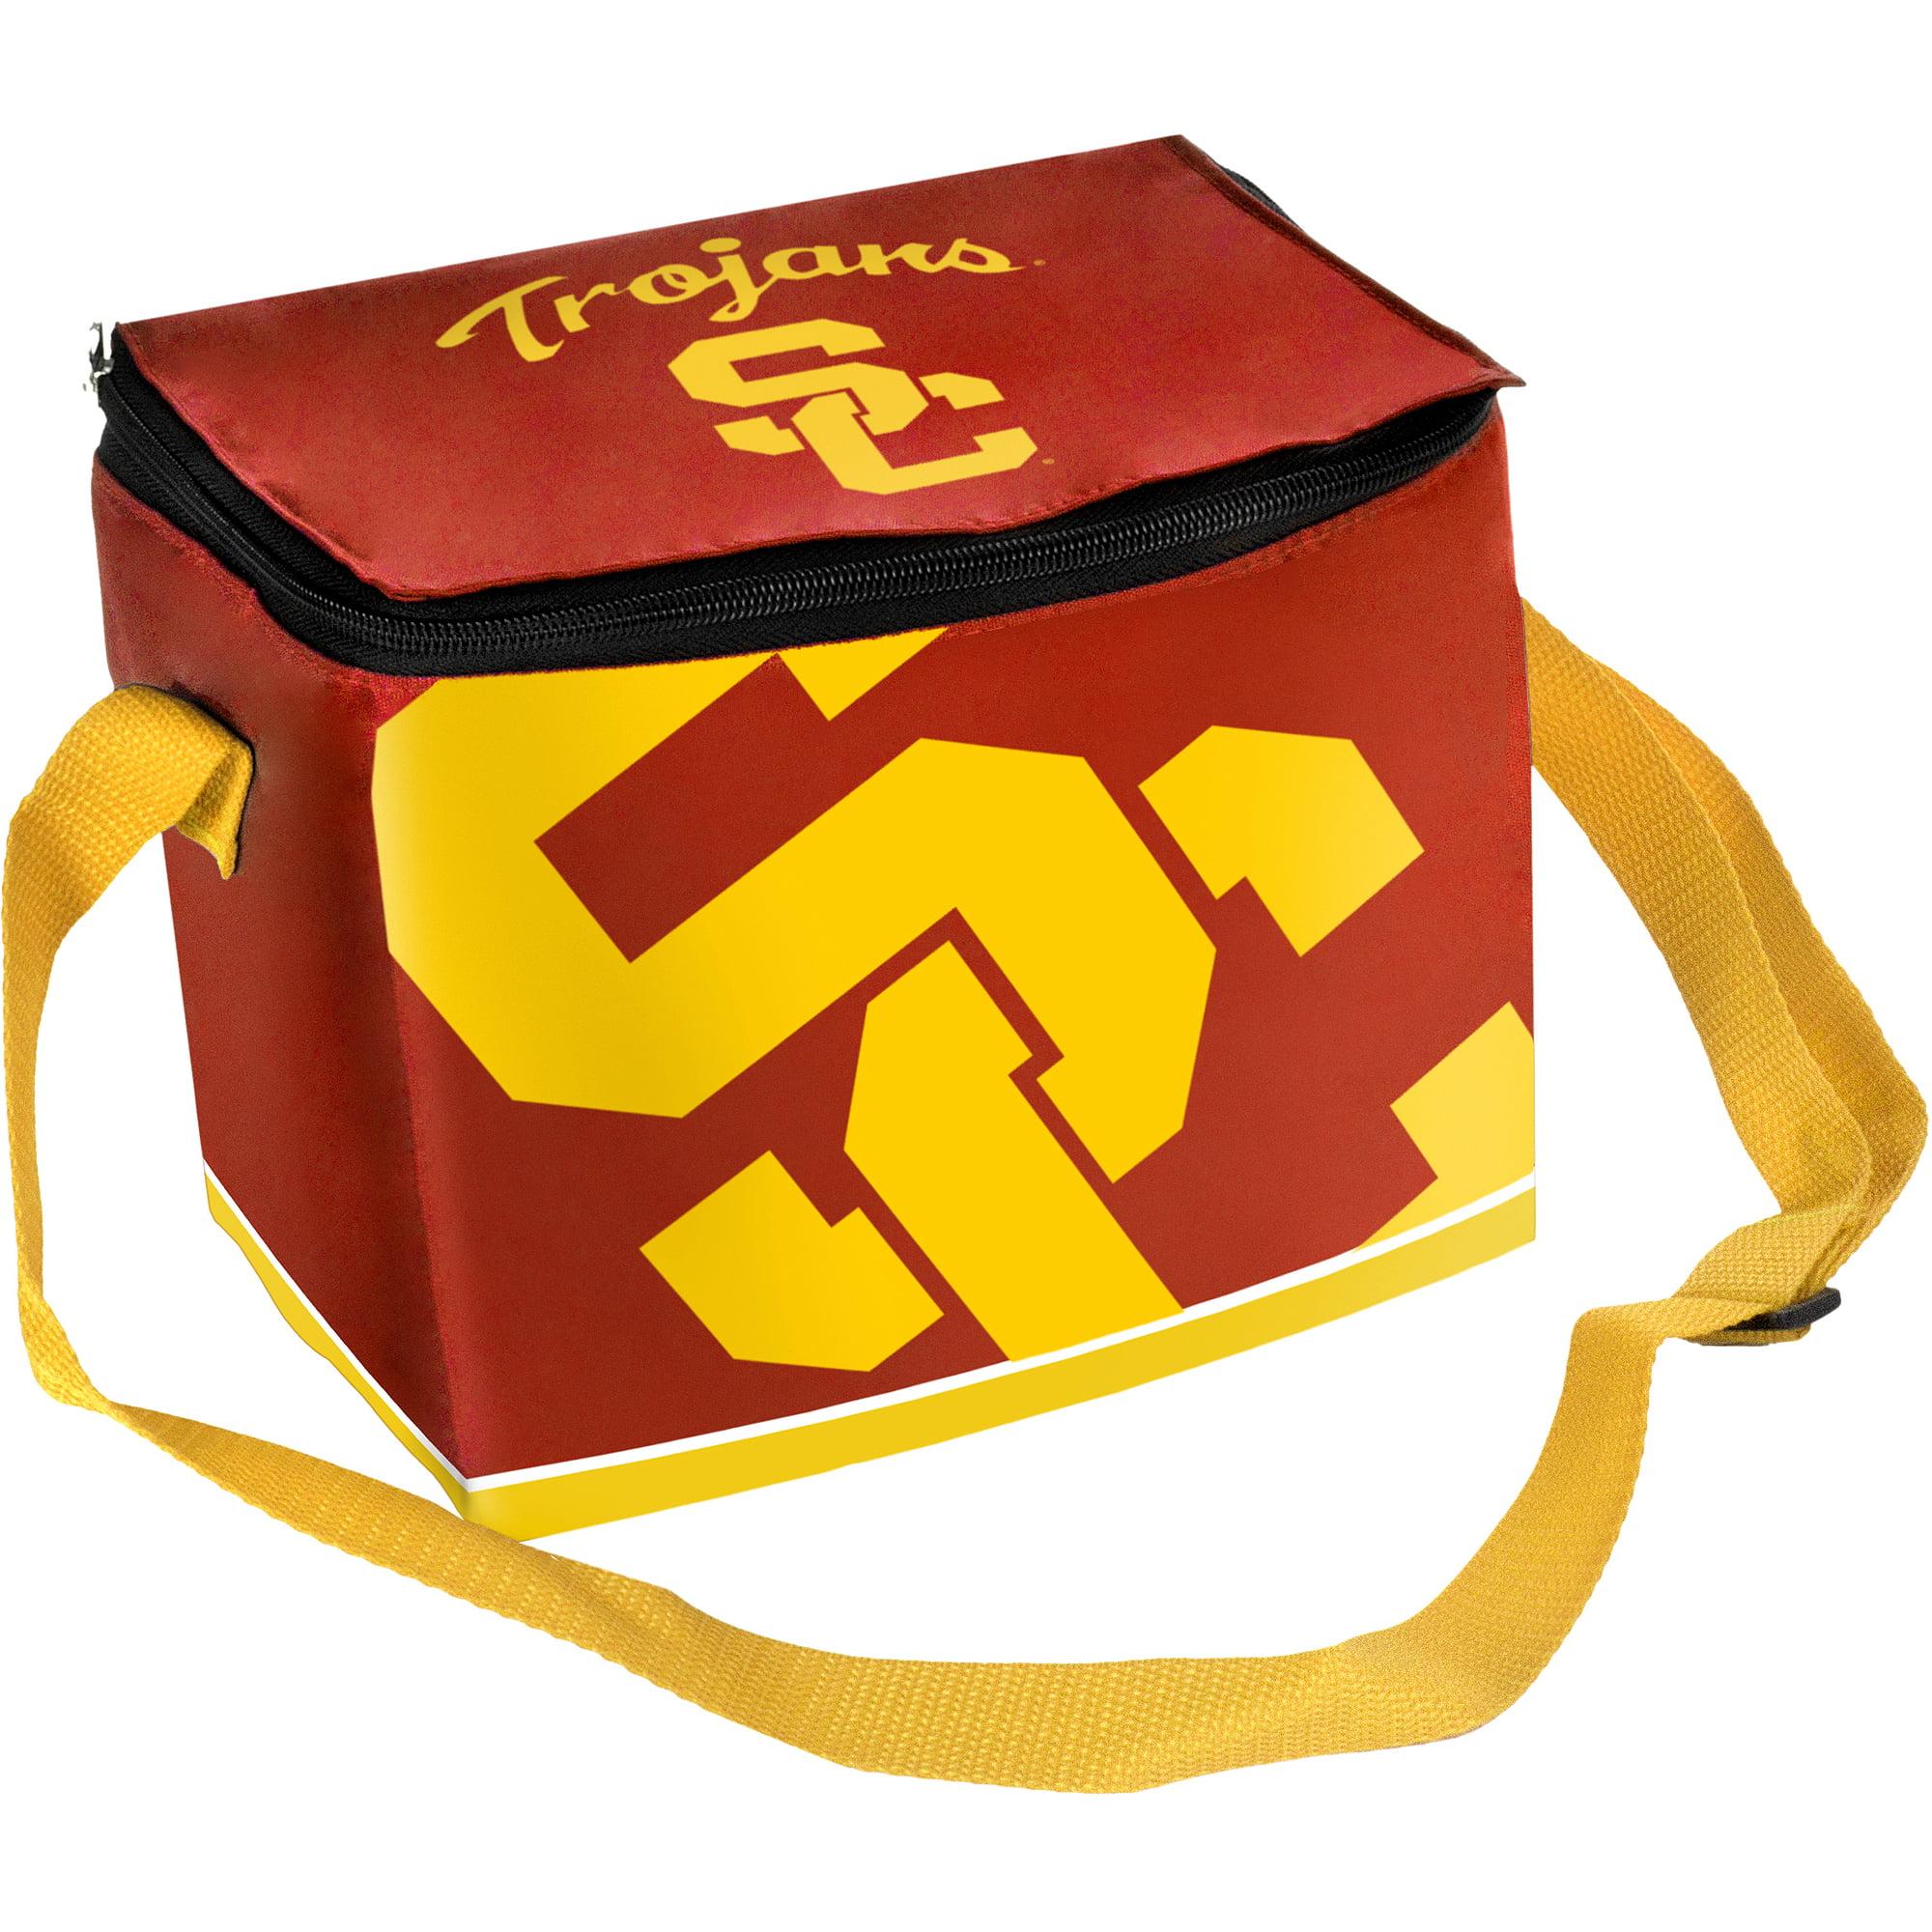 NCAA Zipper Lunch Bag - University of Southern California Trojans - USC